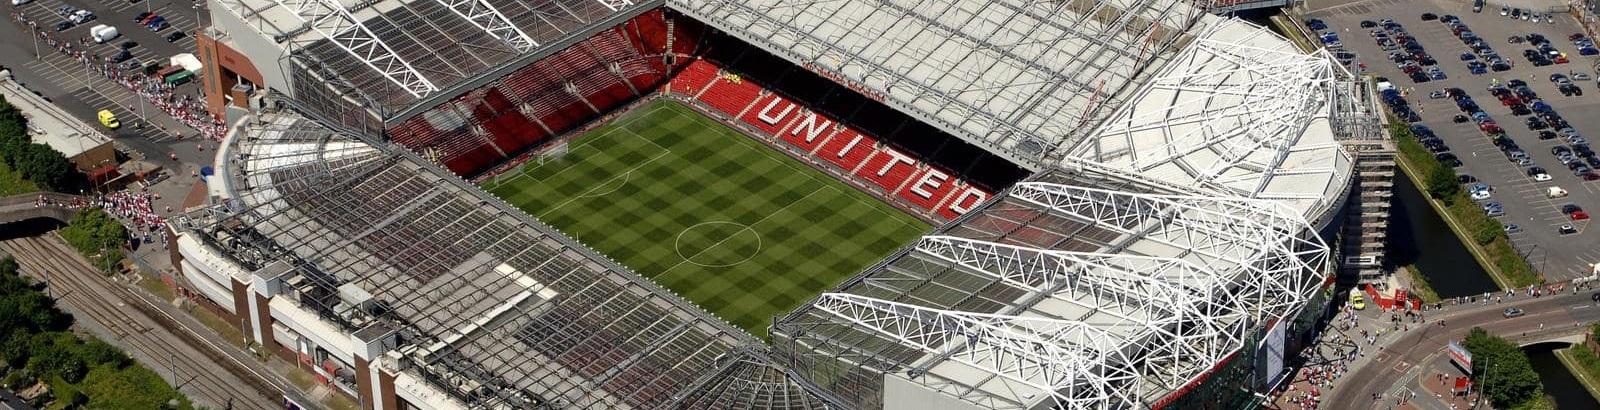 Manchester United Matchday Accommodation